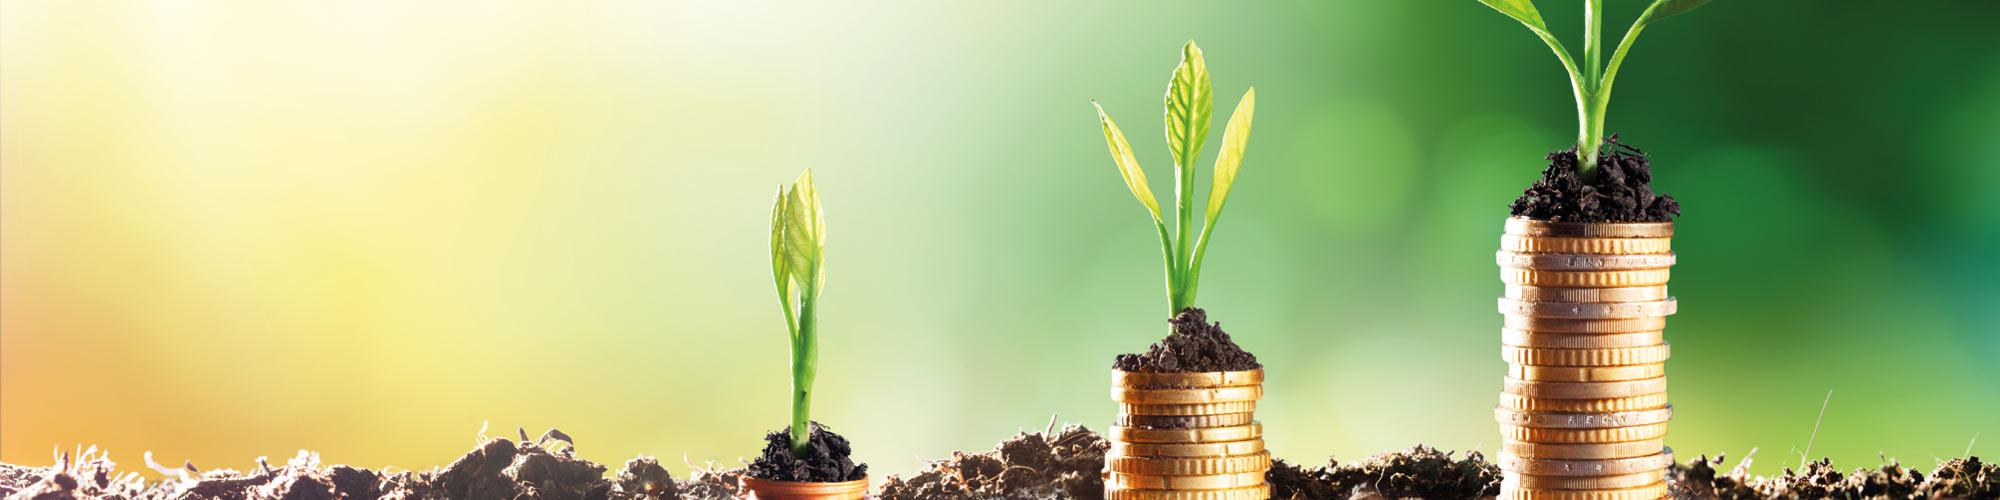 Encontro reflete sobre necessidades financeiras e propósito de vida após os 50 anos